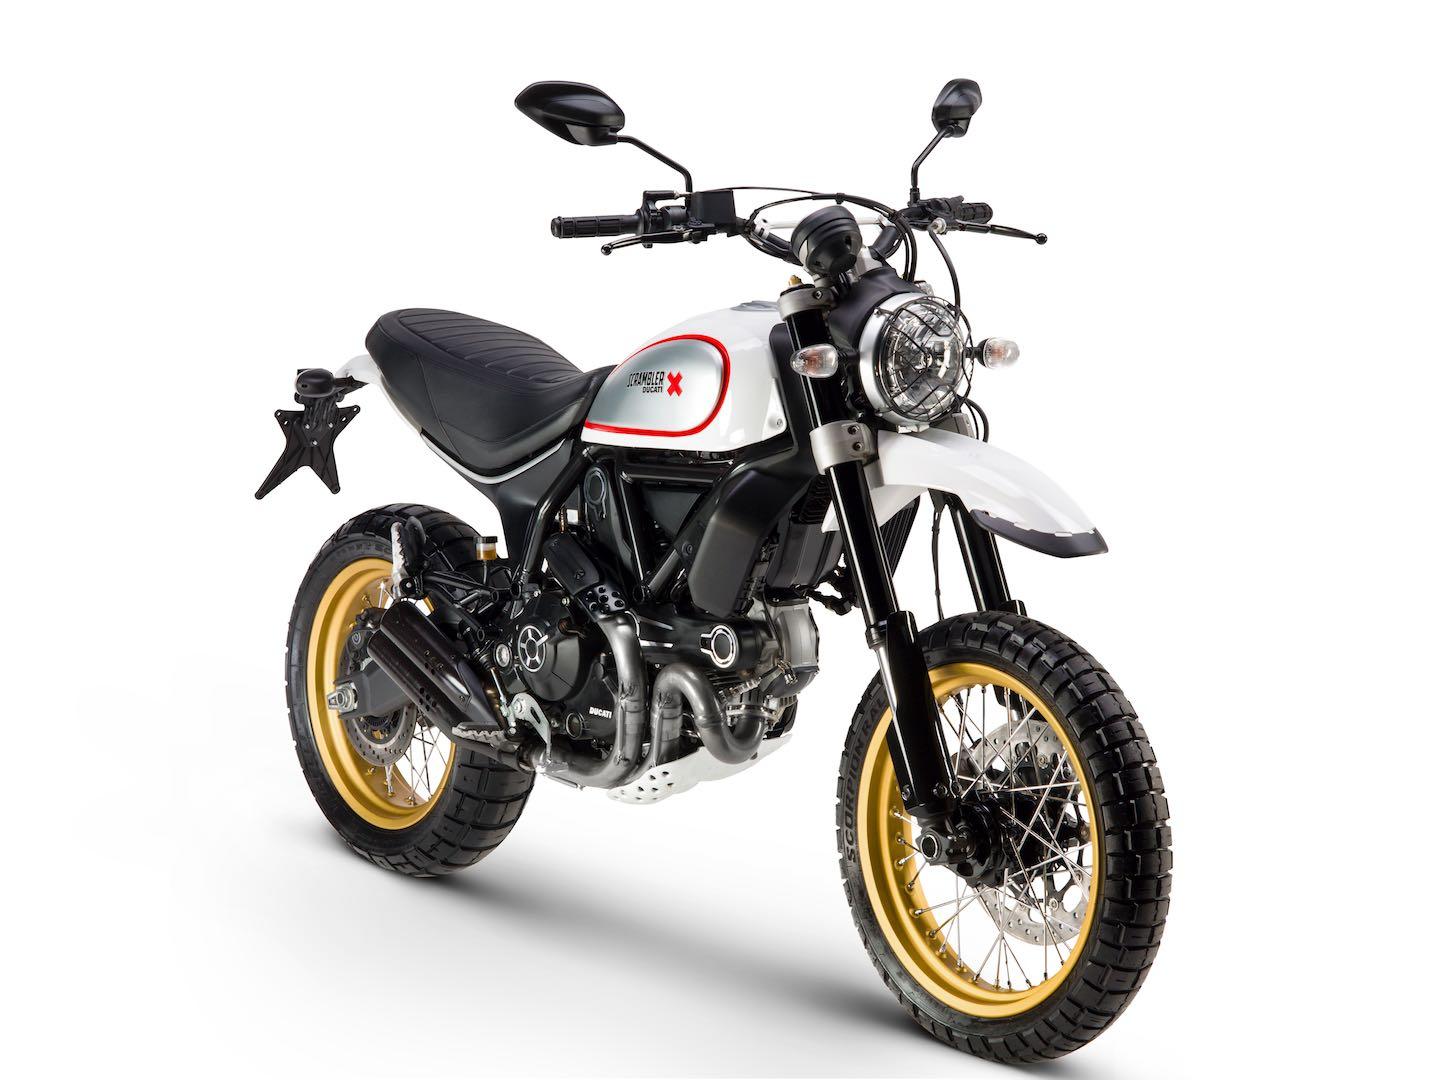 2017 Ducati Scrambler Desert Sled First Look | Fast Facts